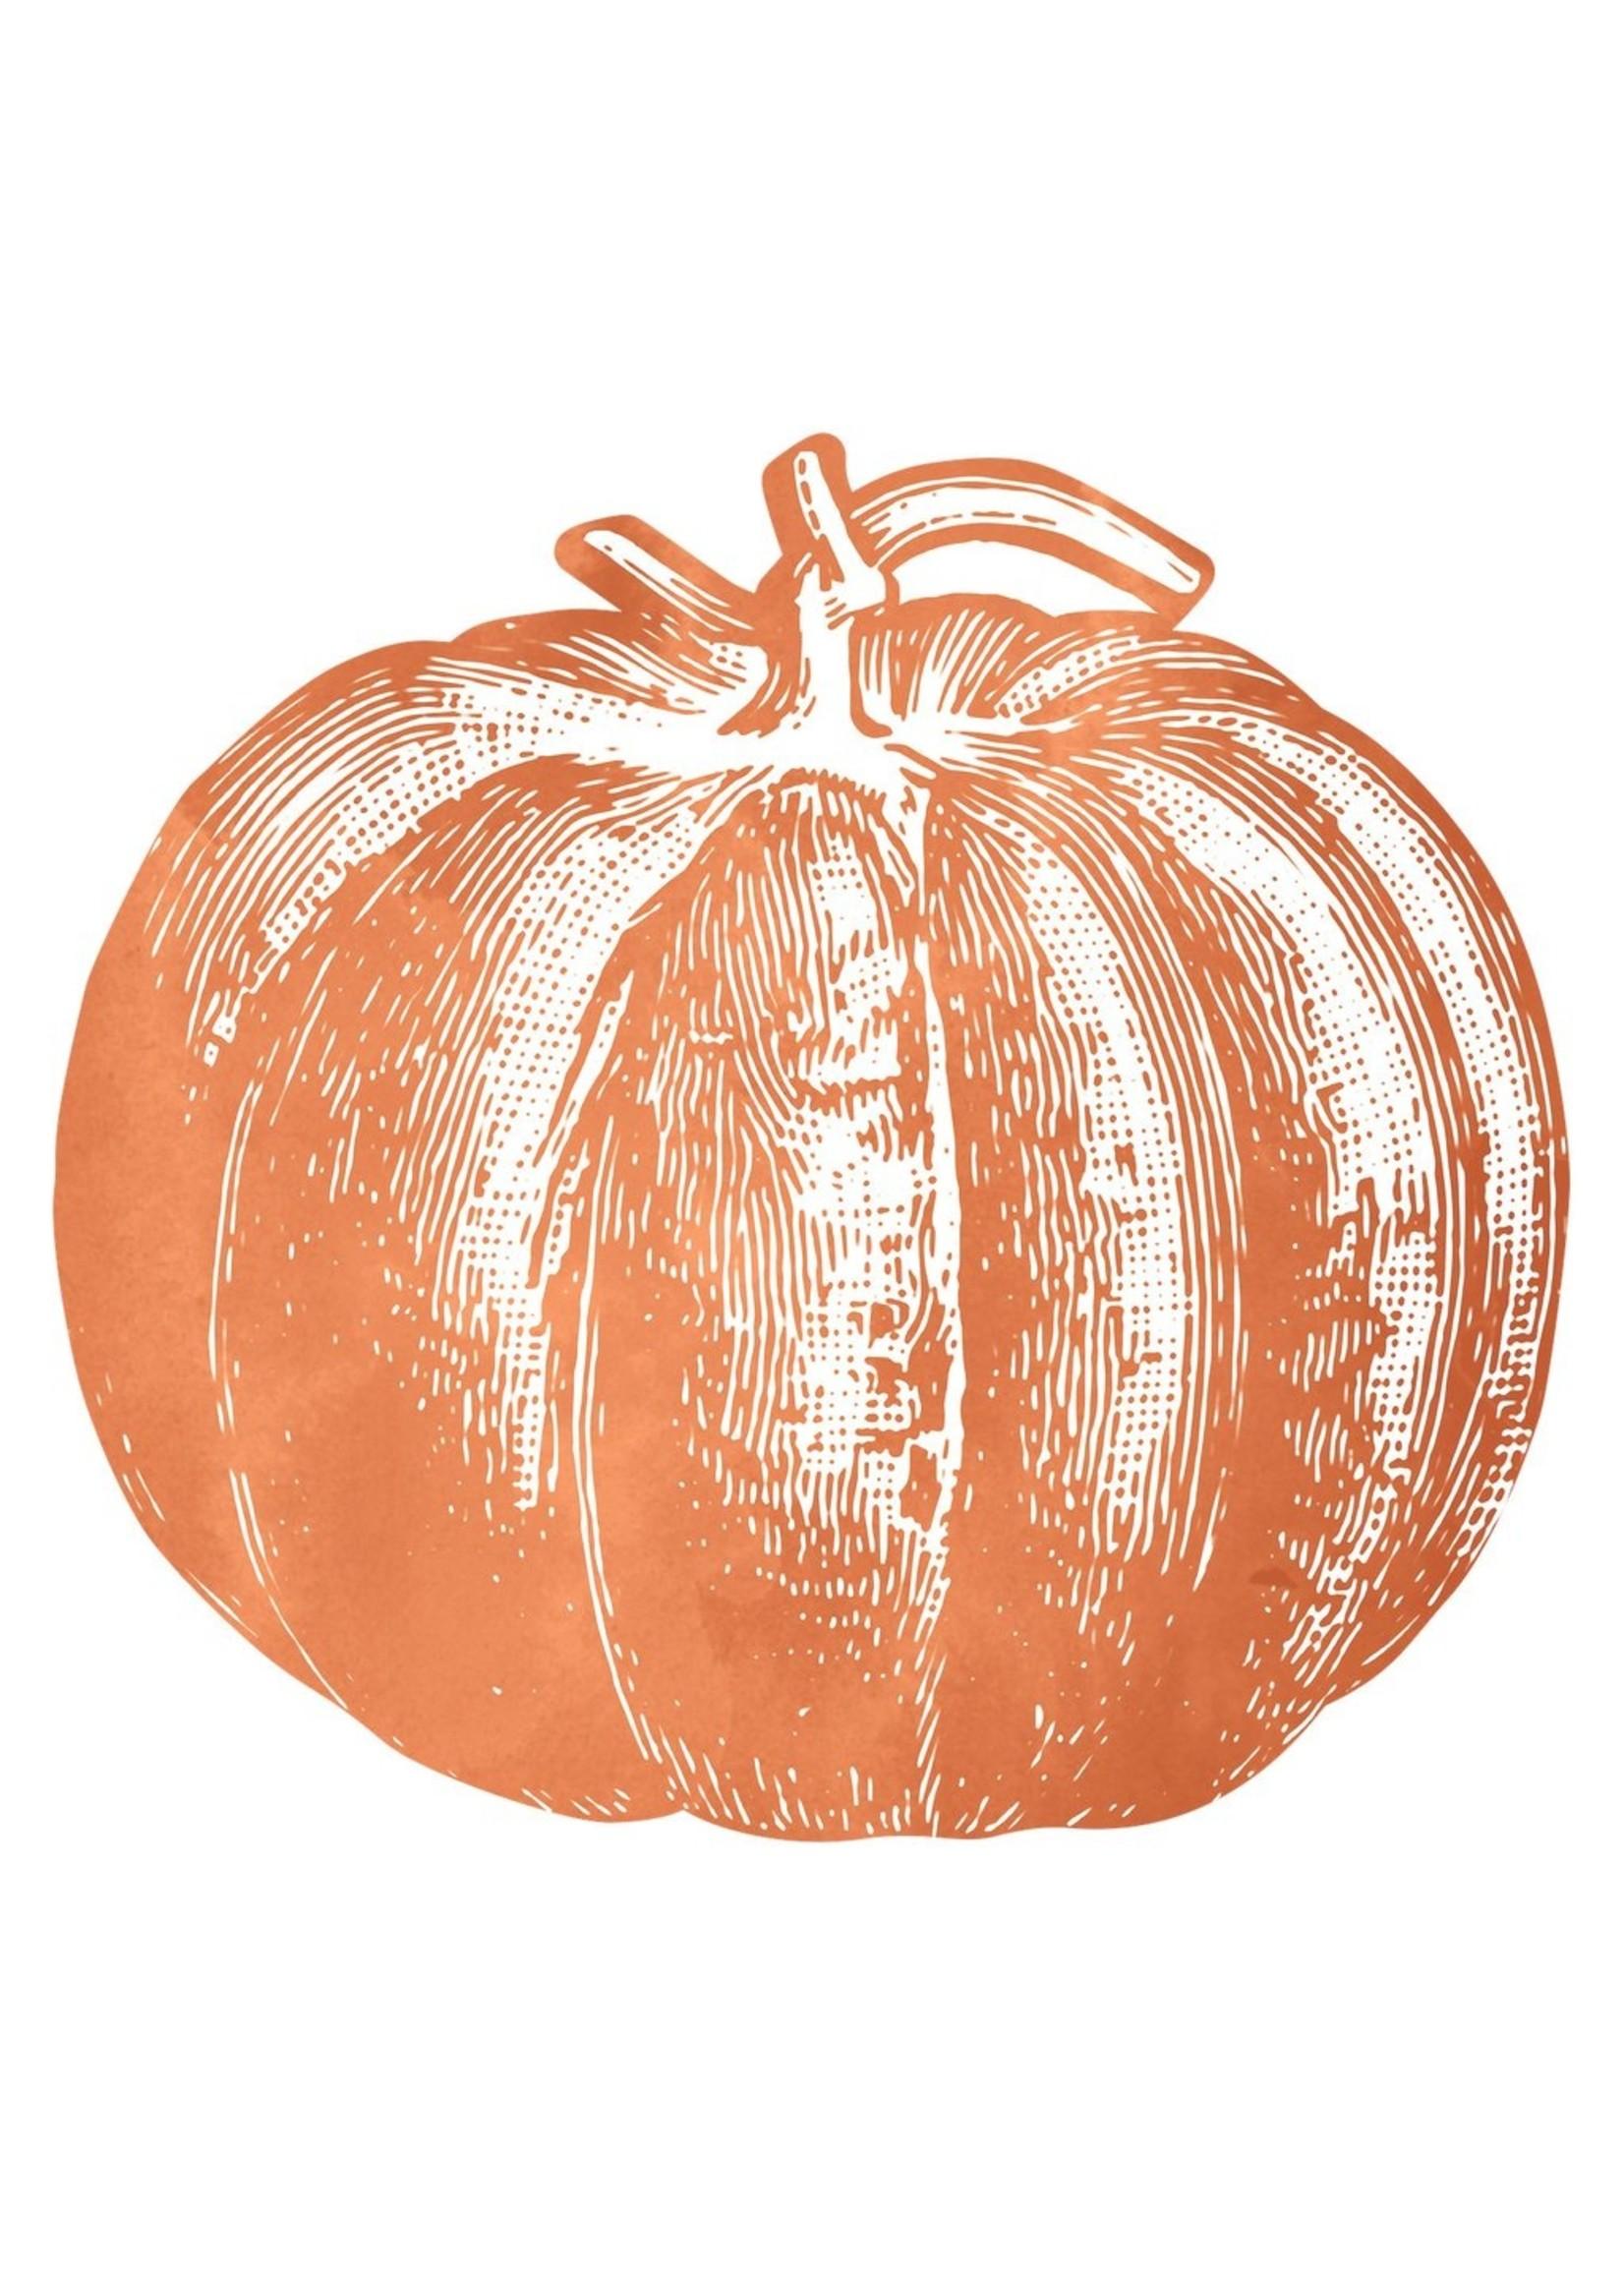 Hester & Cook Die Cut Pumpkin Placemat